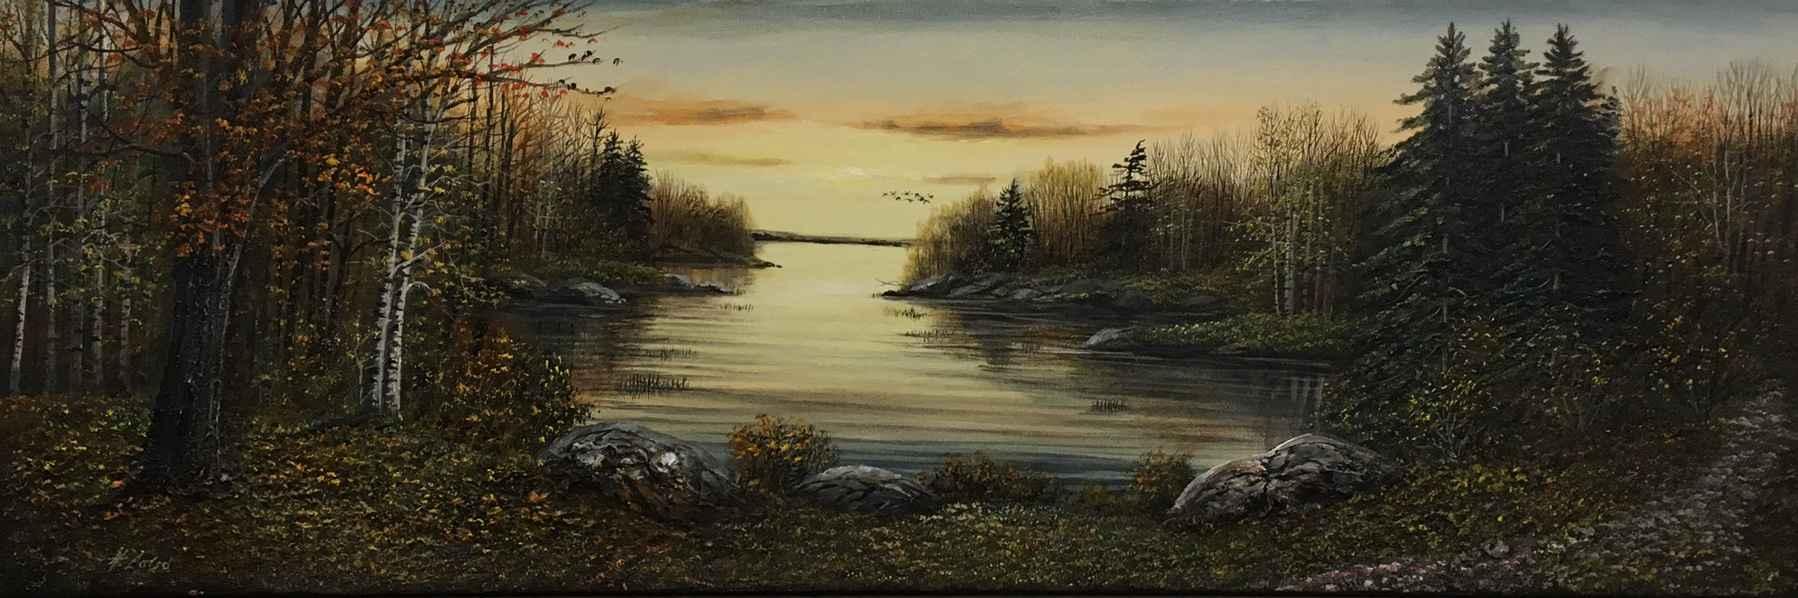 Muskoka At Dark by  Henry Lobo - Masterpiece Online